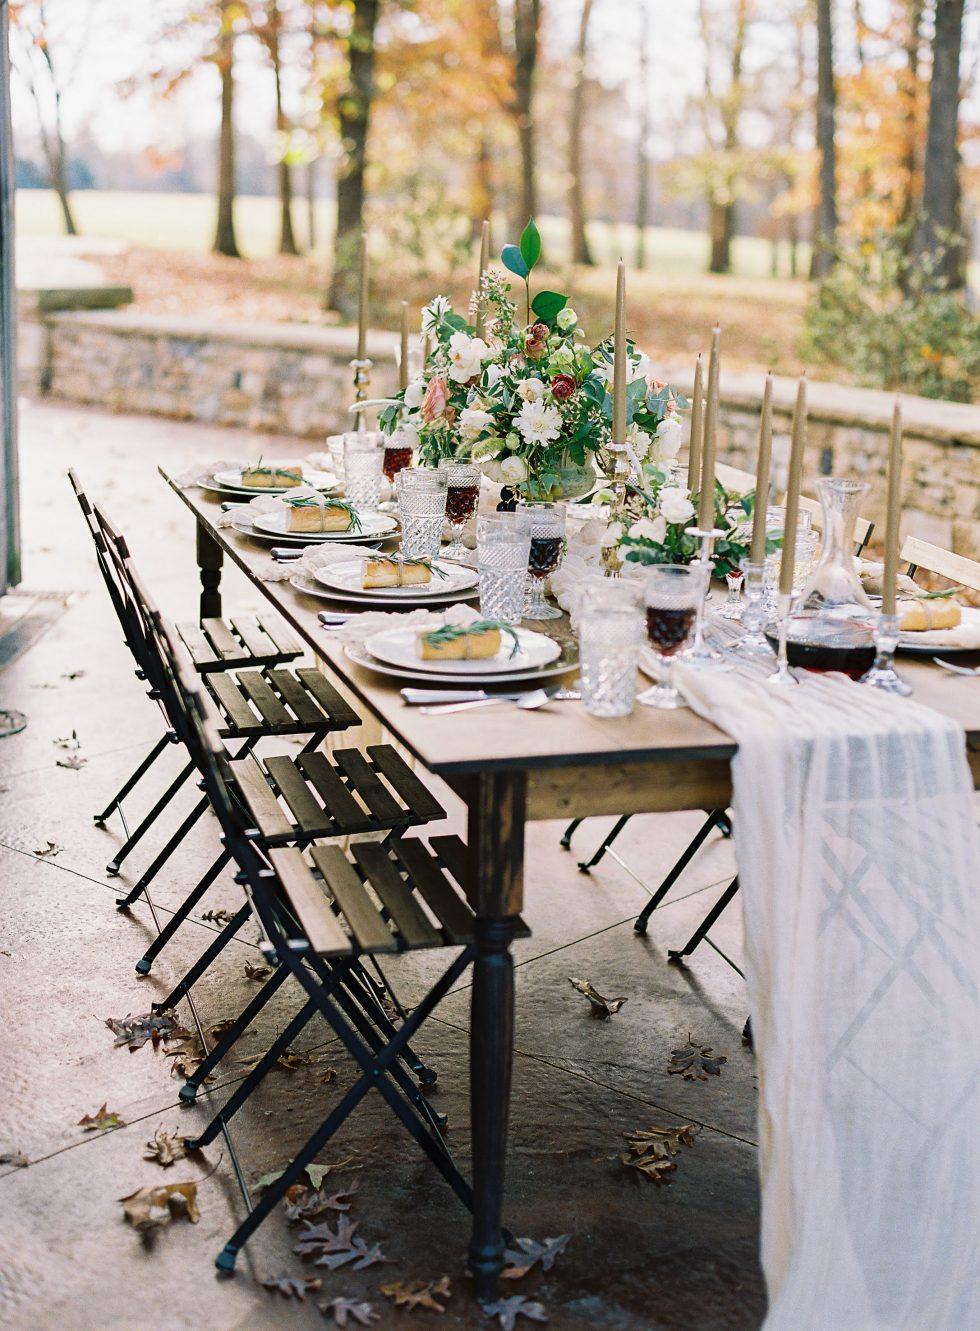 Summerfield-Farms-Outdoor-Fall-Wedding033